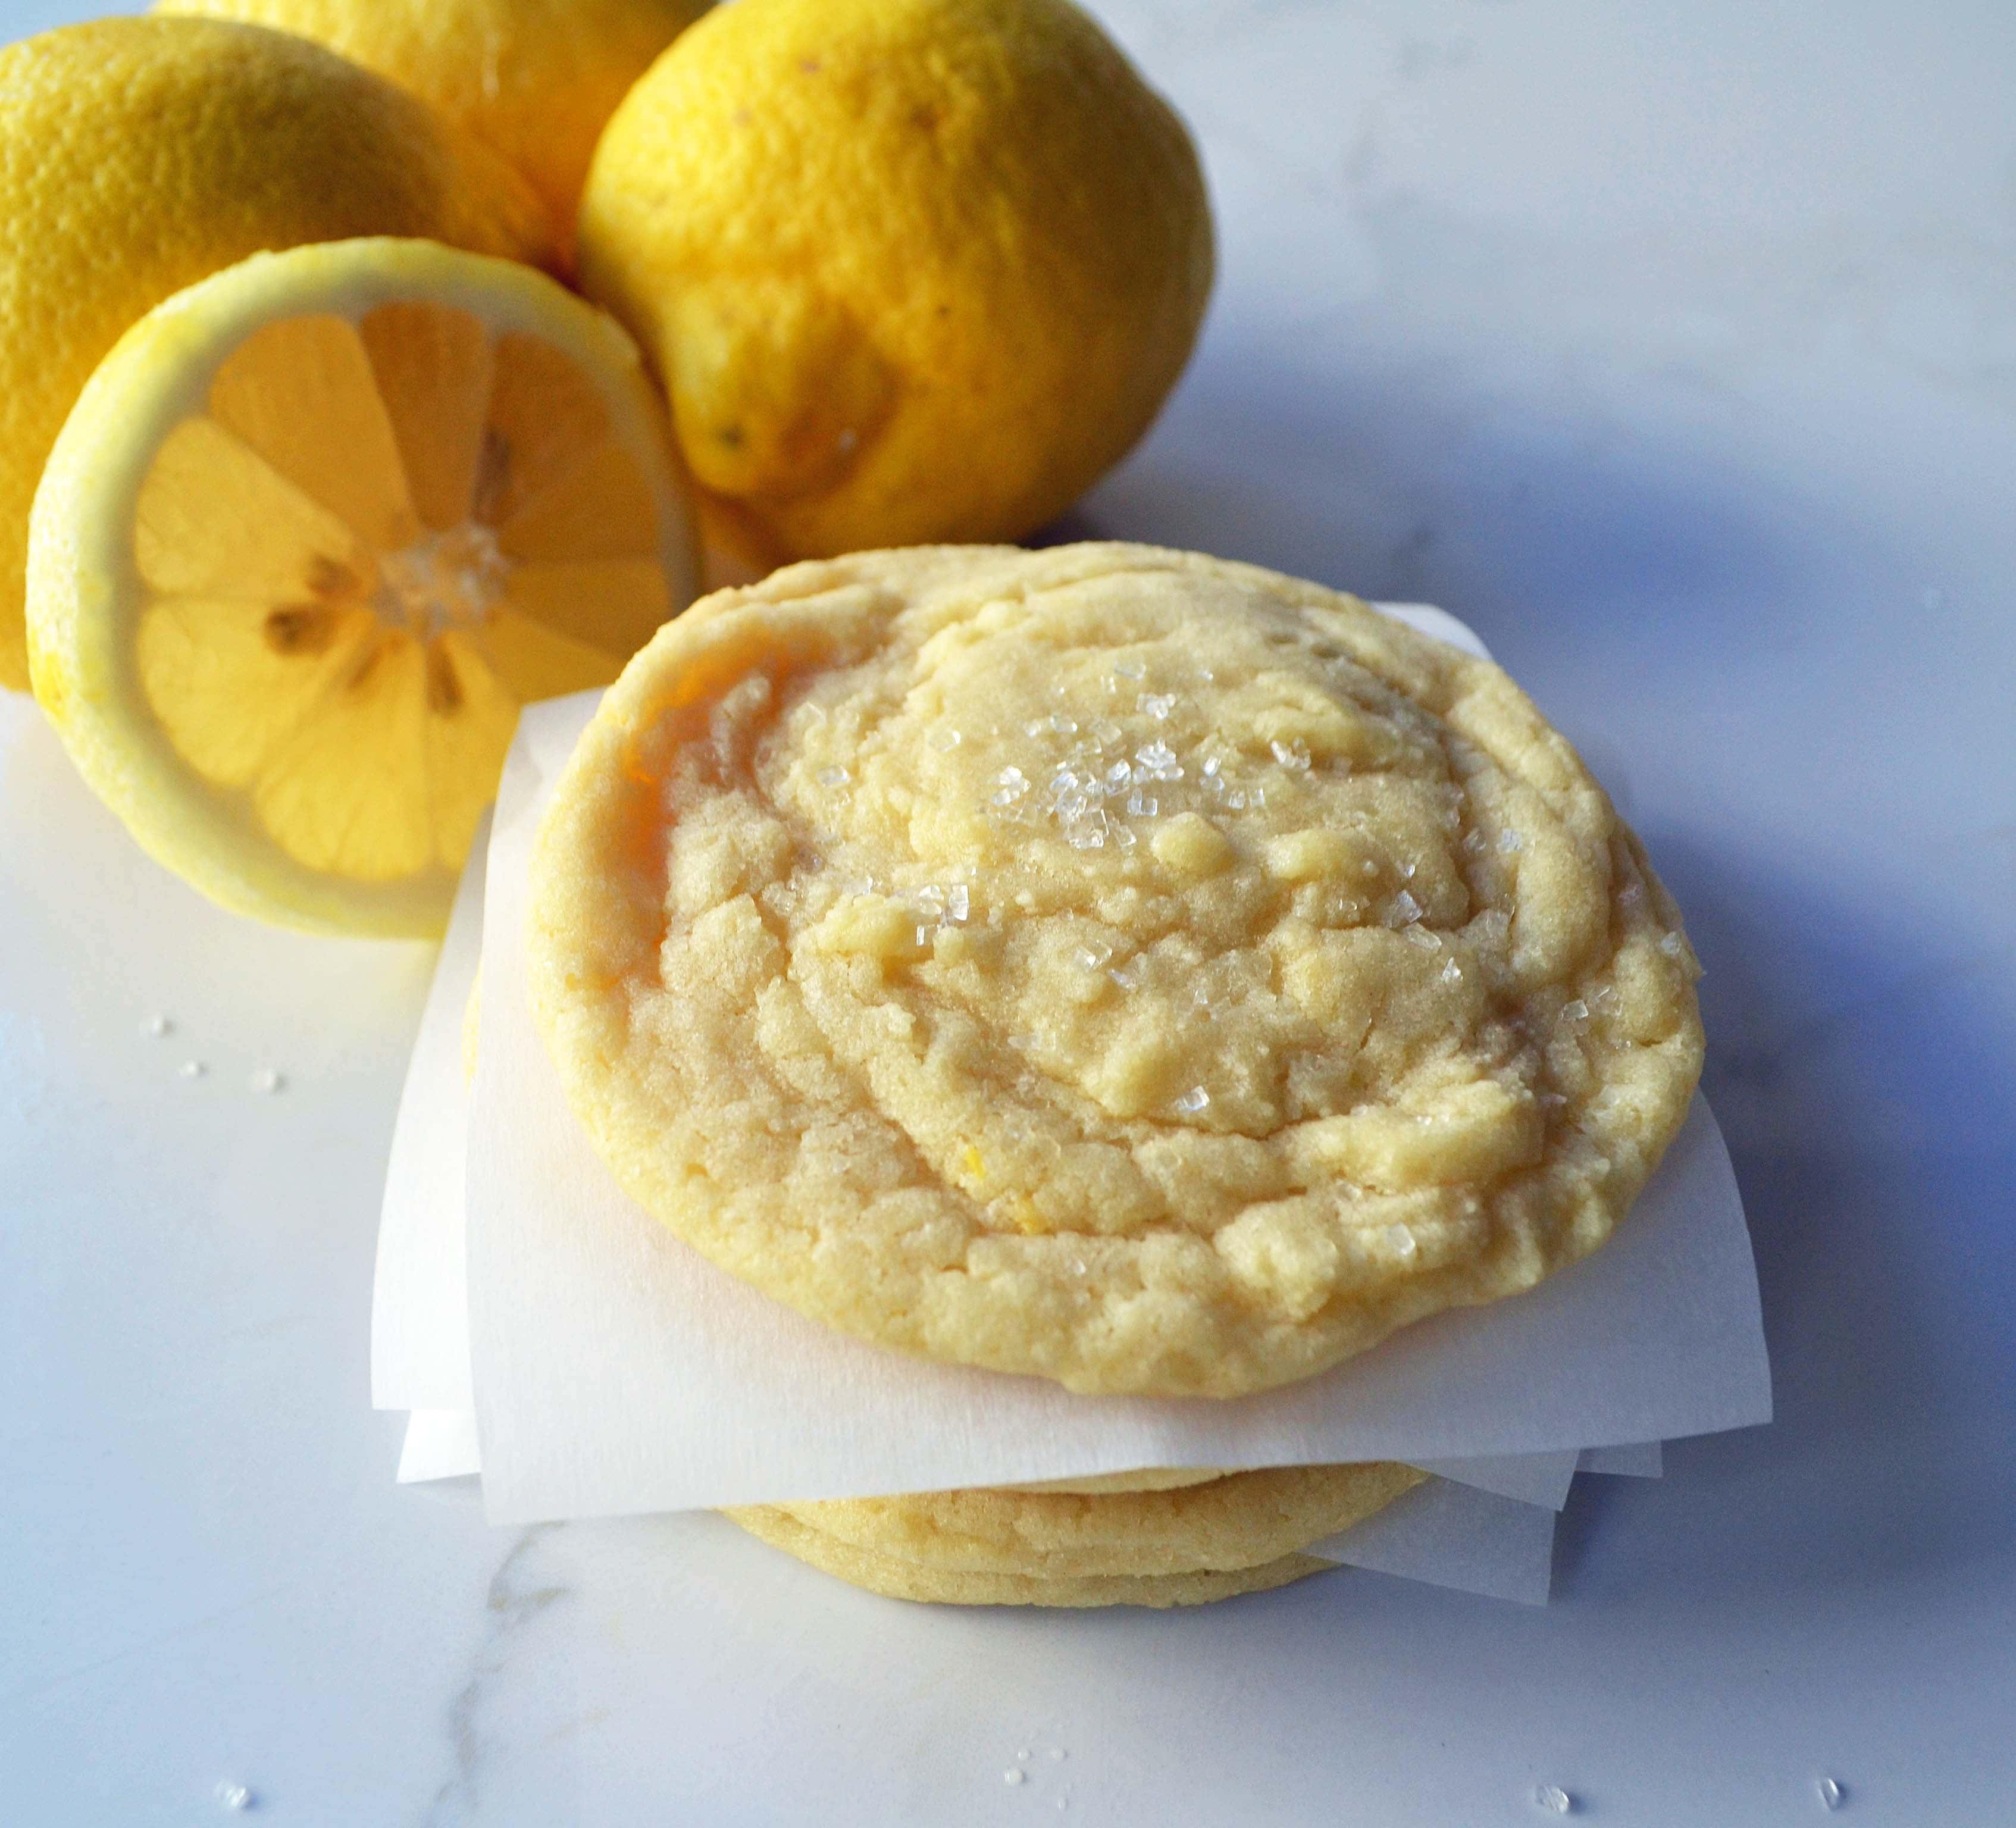 Lemon Sugar Cookies. Soft lemon zest cookies are one of the most popular and crowd pleasing cookies. www.modernhoney.com